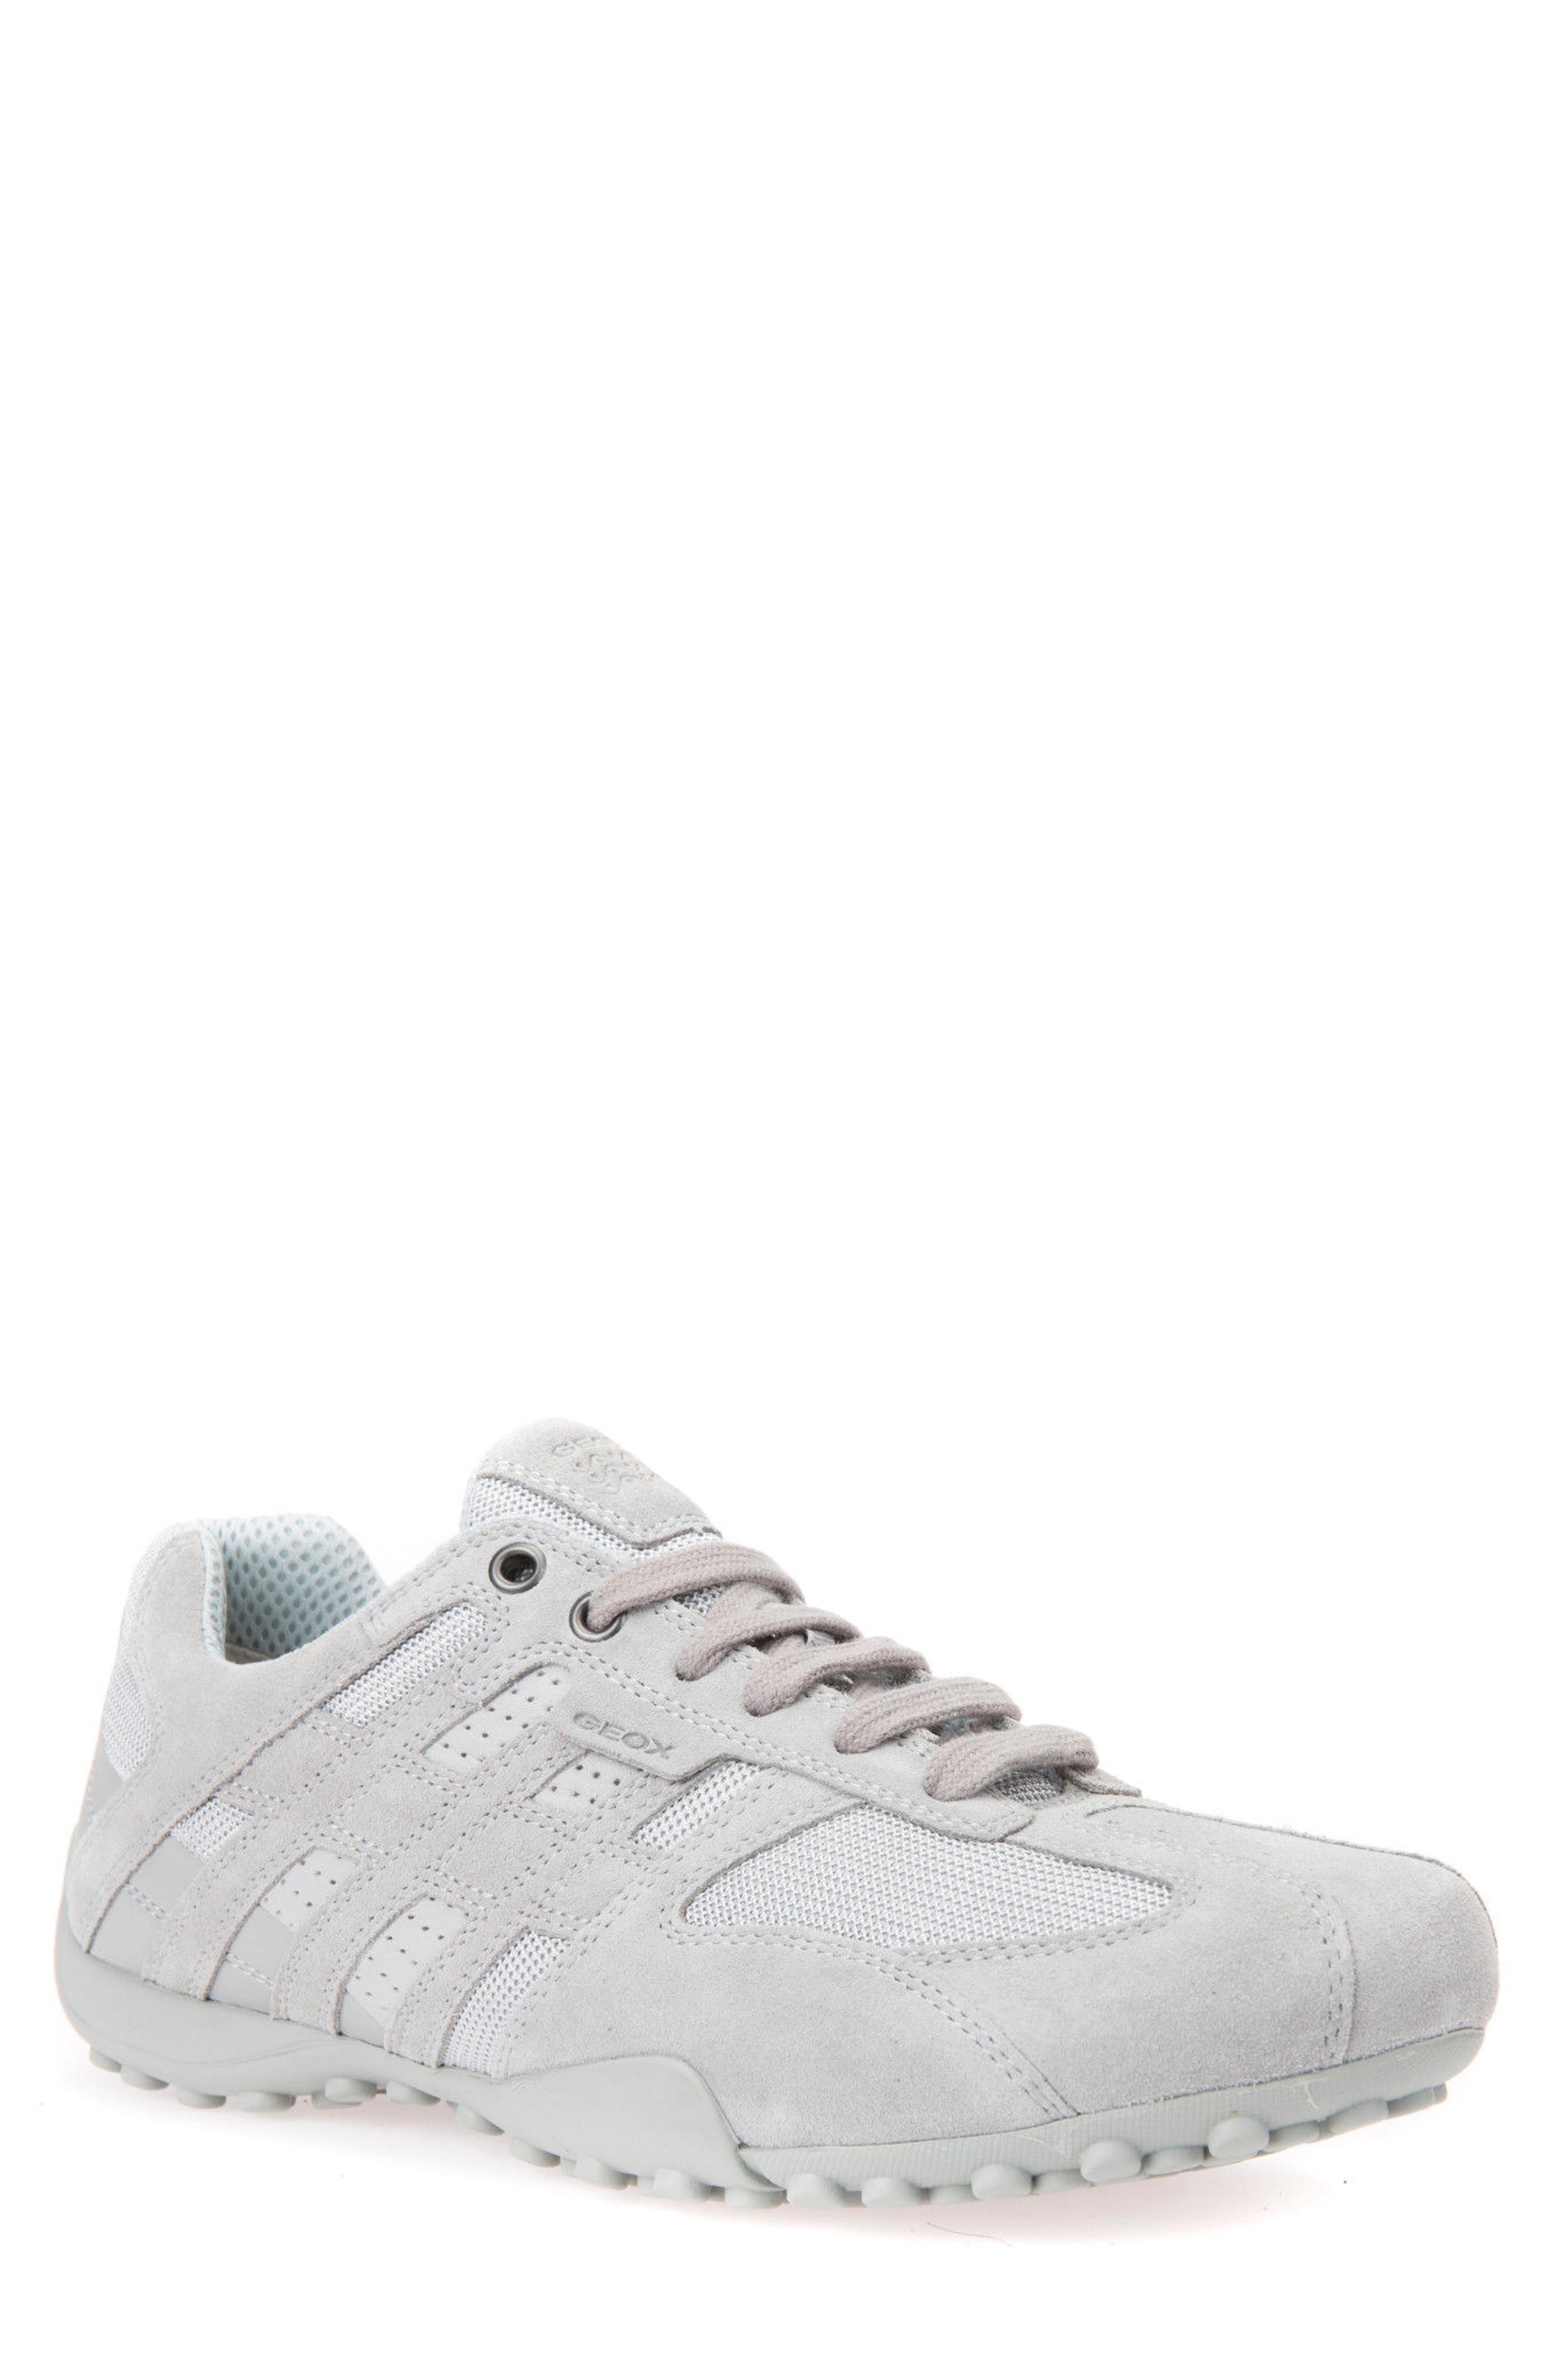 Snake 125 Low Top Sneaker in Light Grey